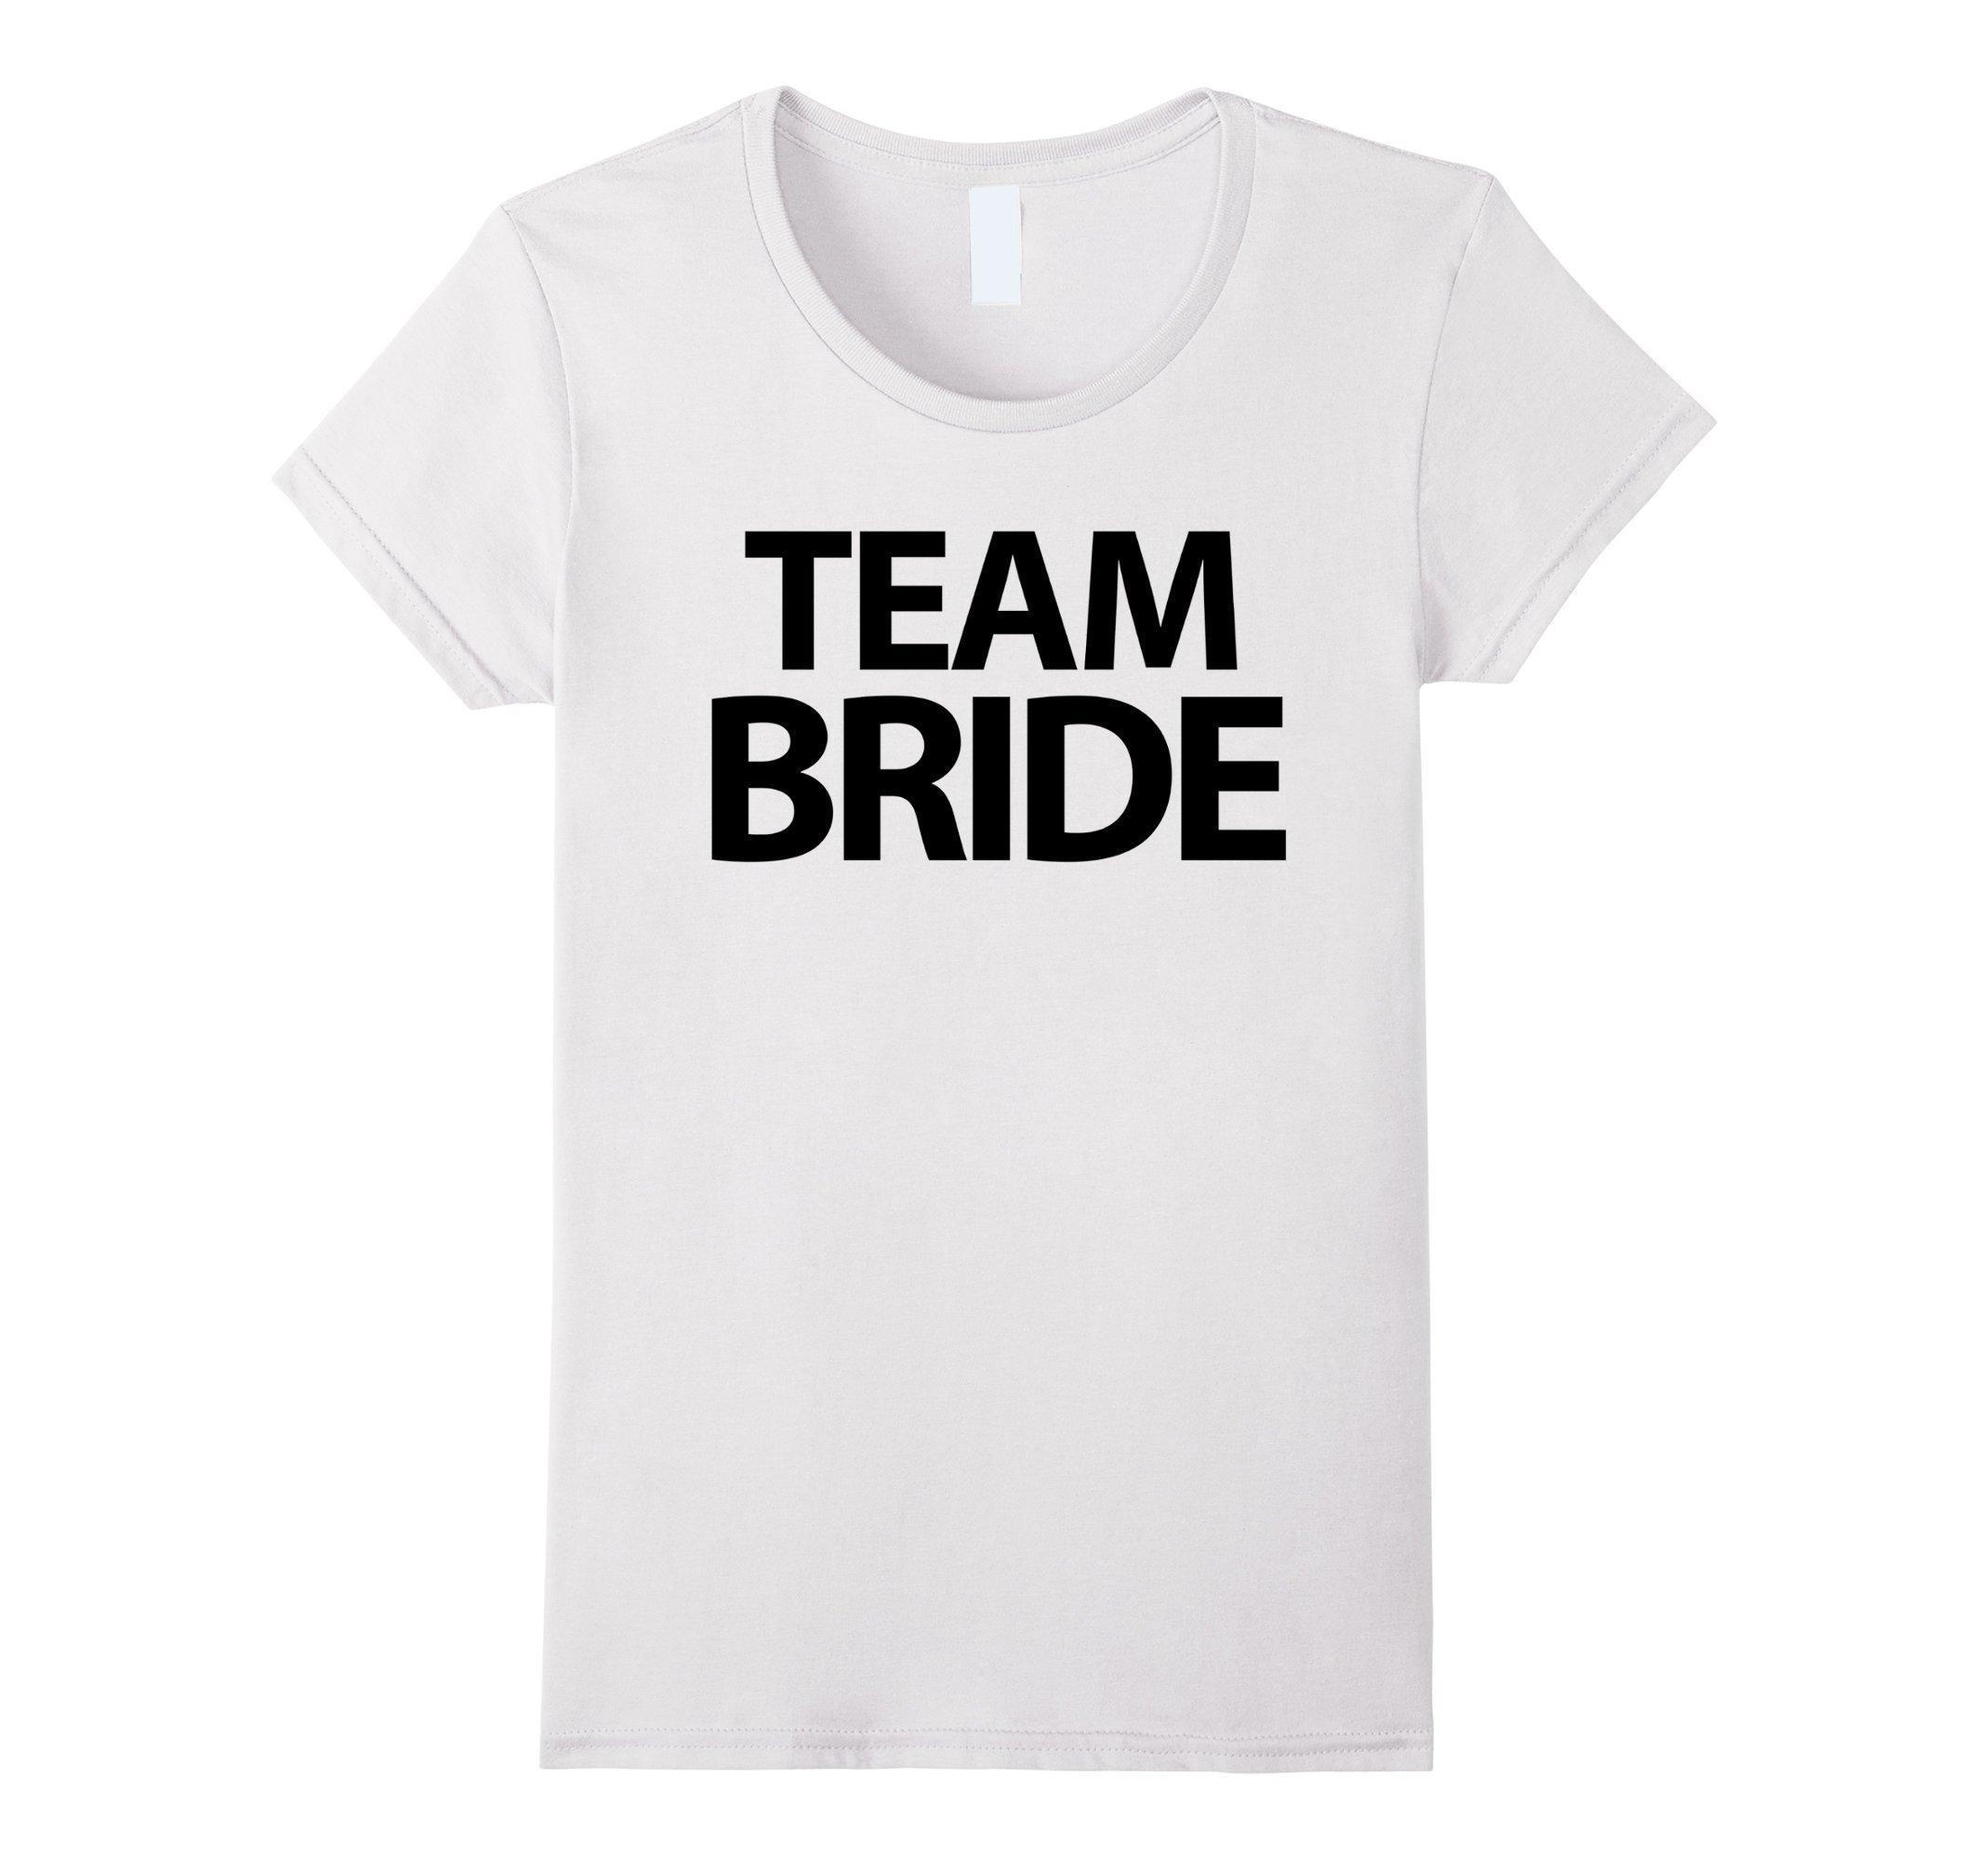 Women's Team Bride Shirts White Bachelorette Party Shirts Large White